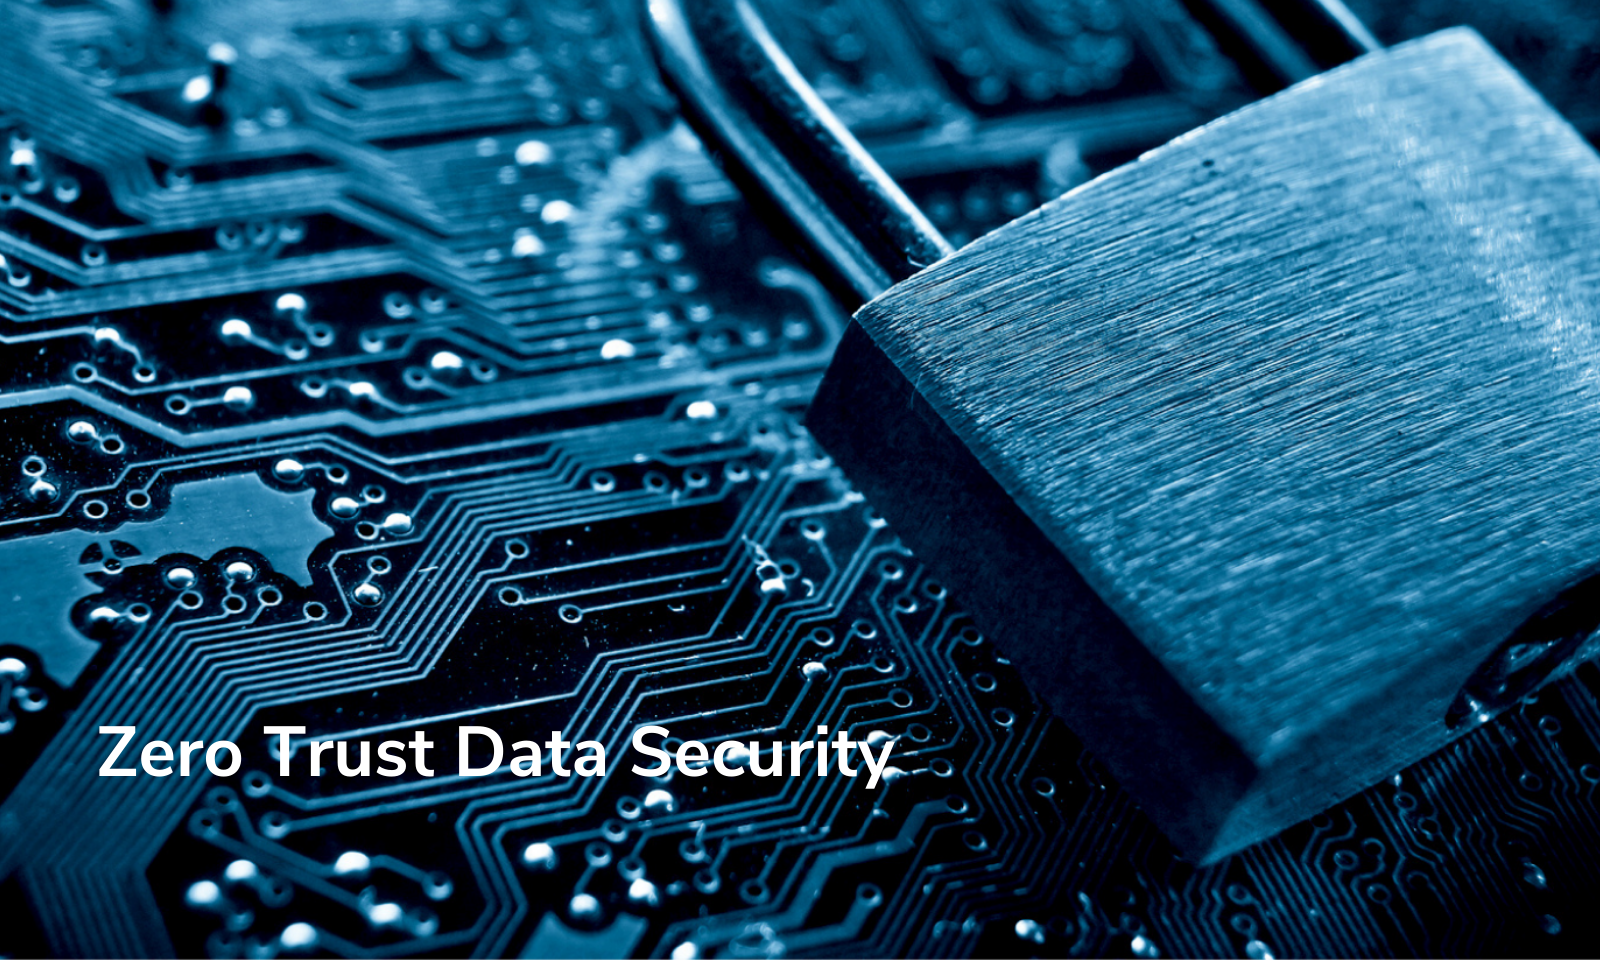 Zero Trust Data Security